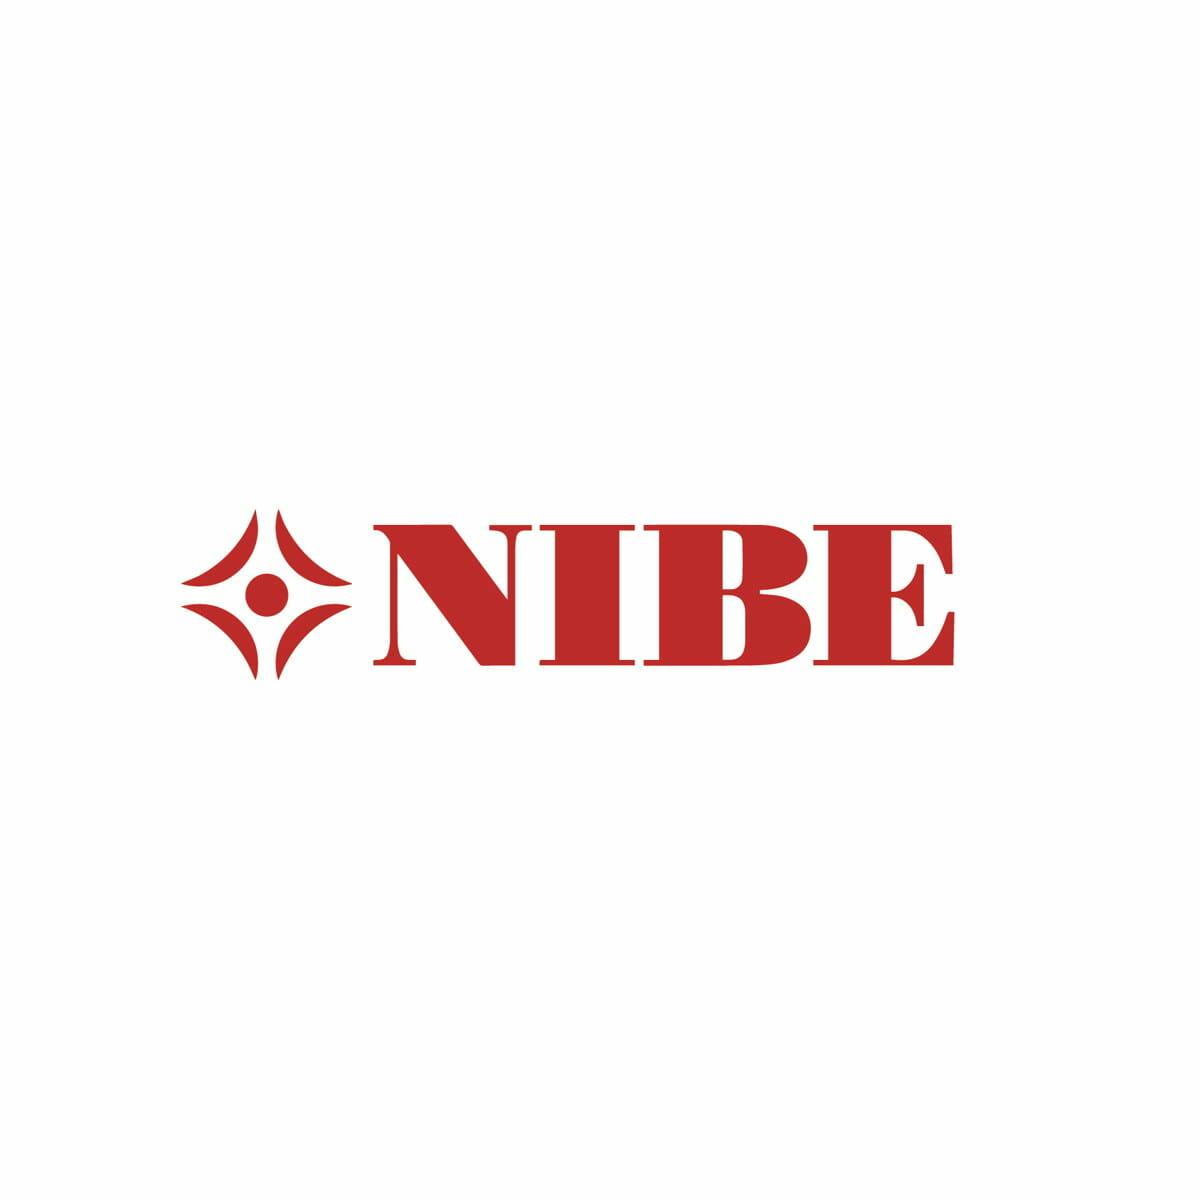 NIBE_logo_standard_red_CMYK.jpeg